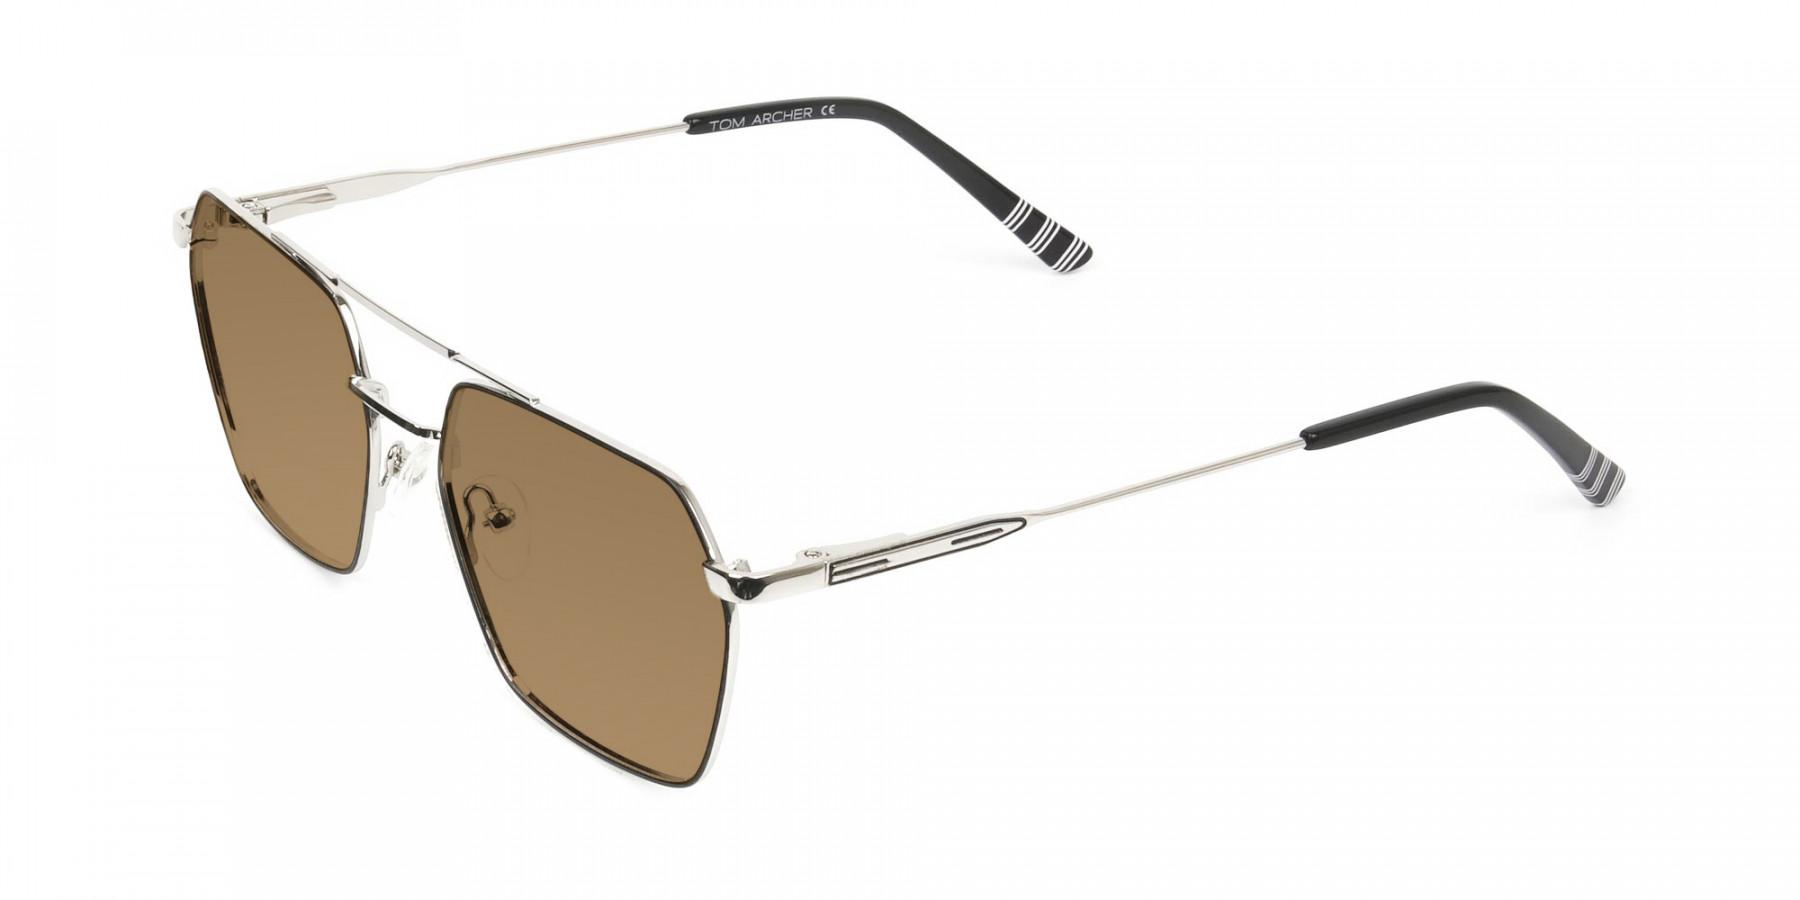 black-silver-metal-geometric-brown-tinted-sunglasses-3